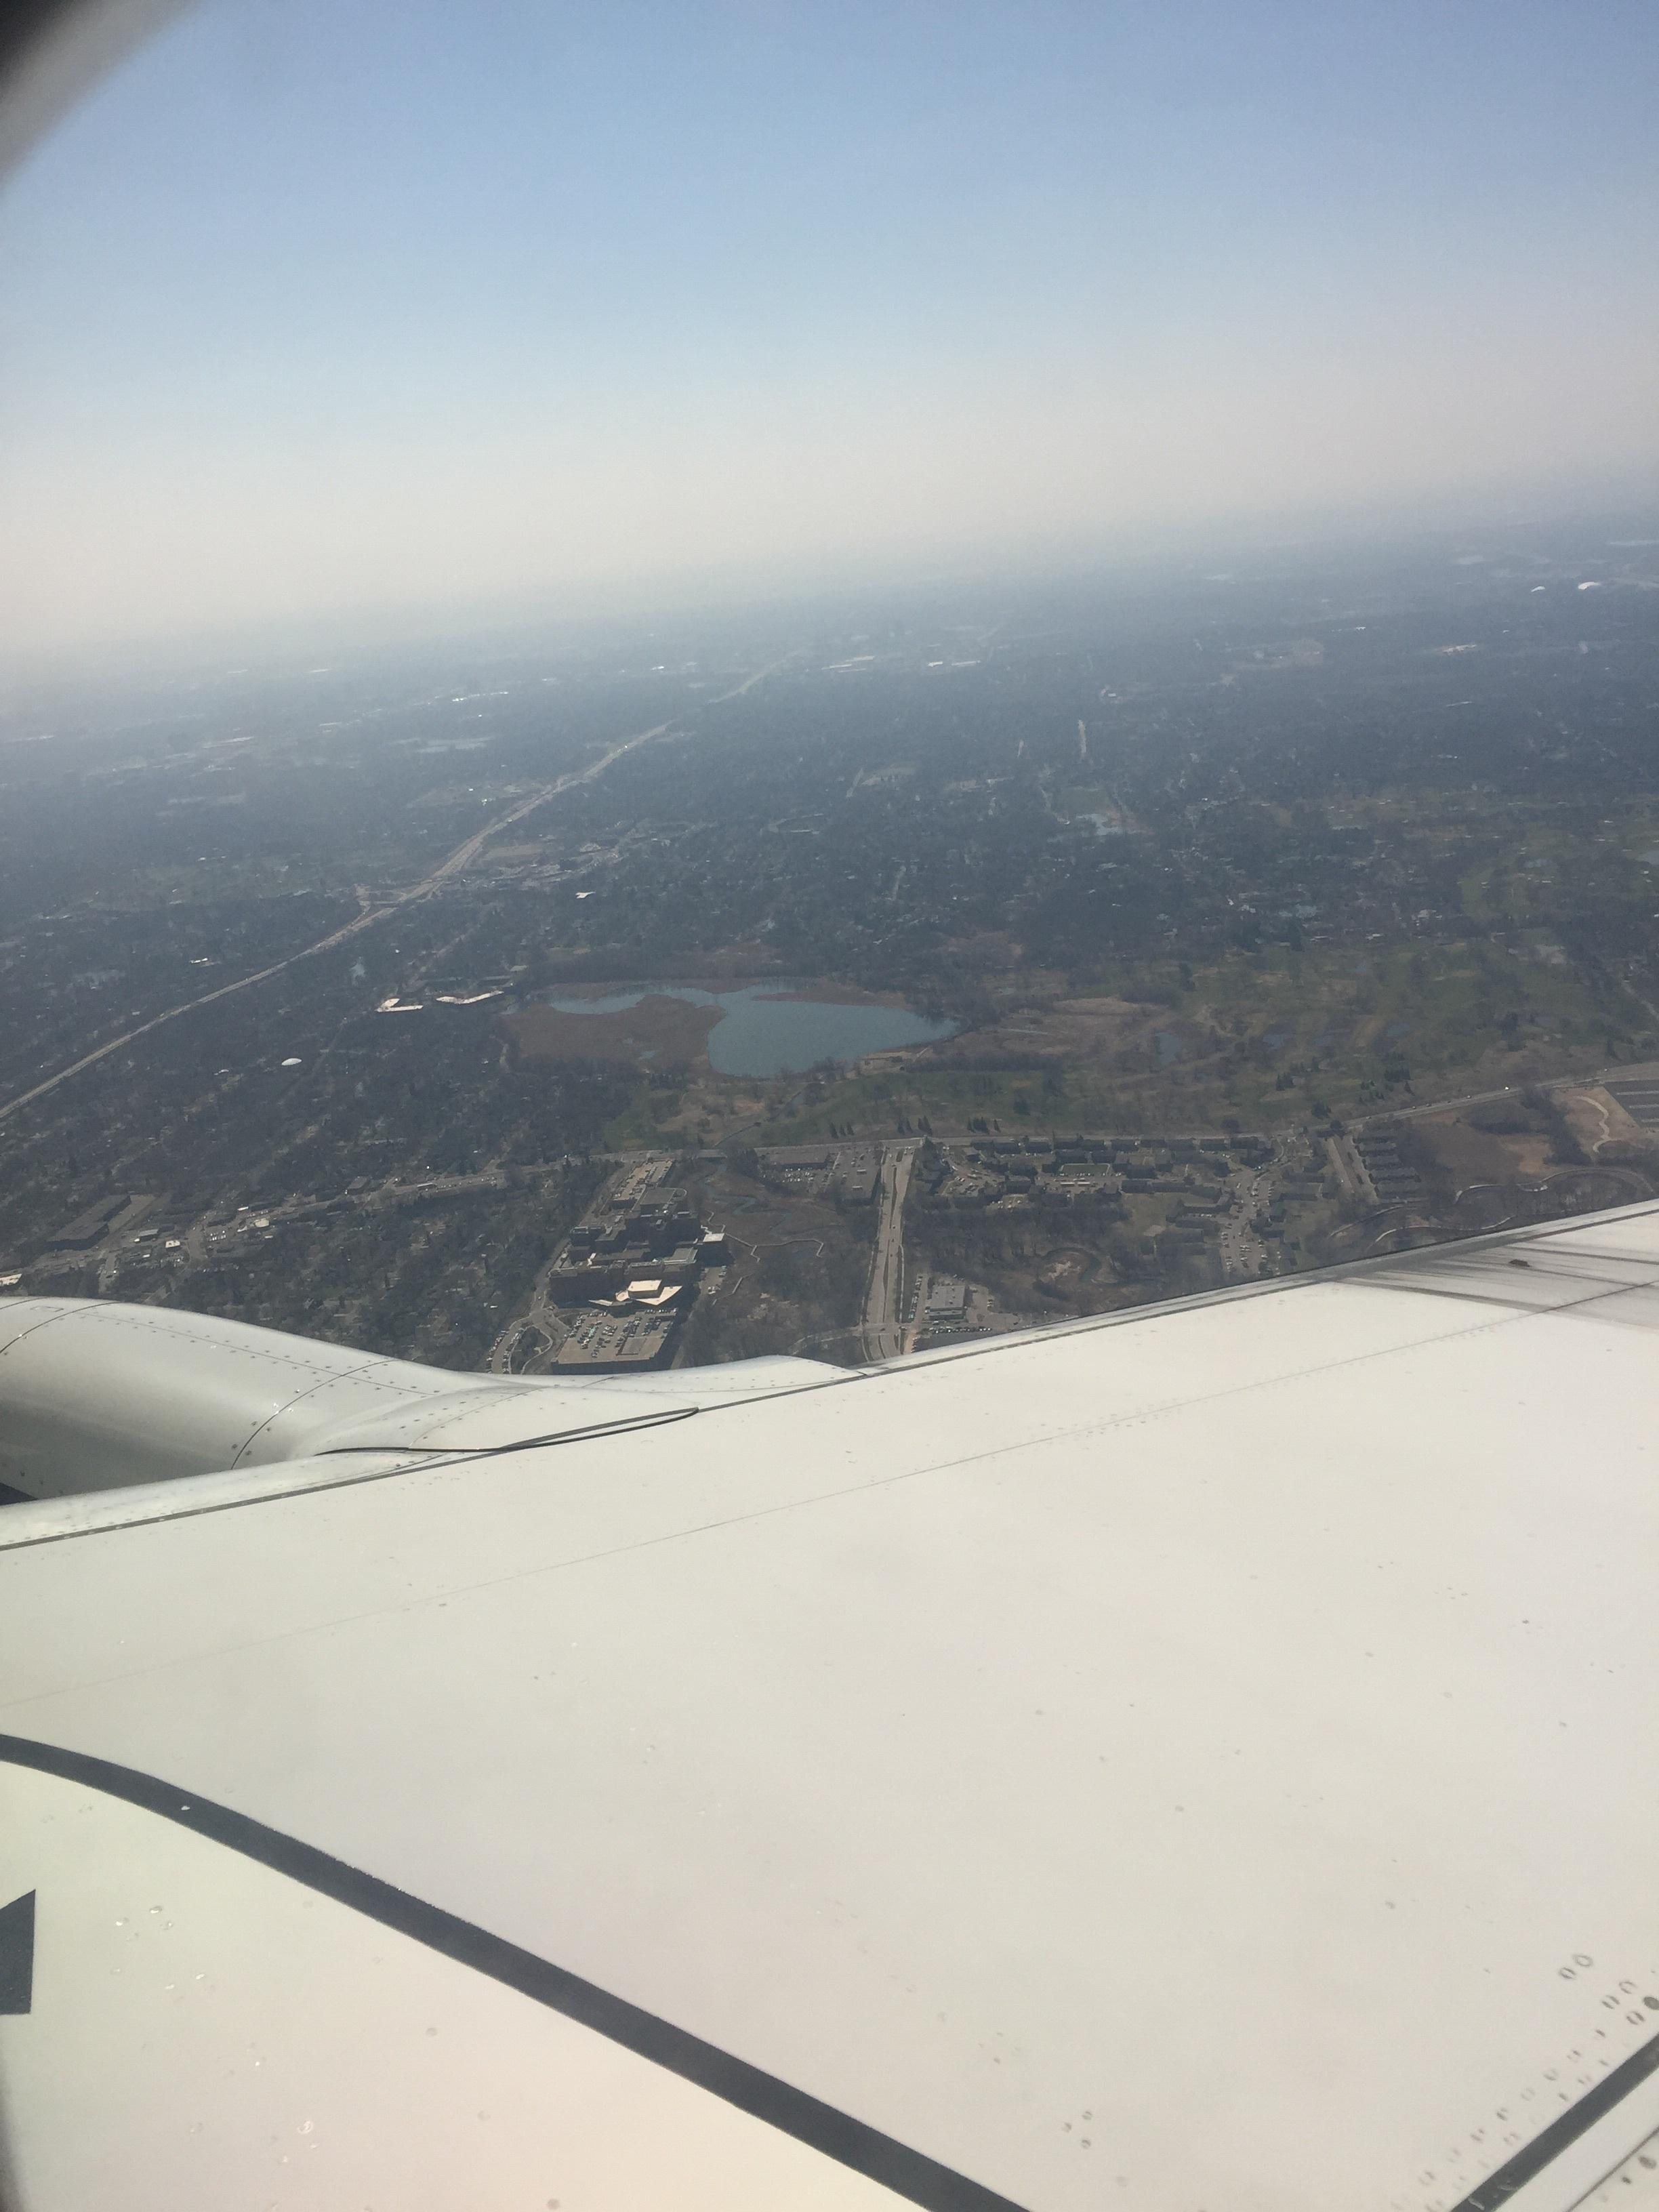 Somewhere over Minnesota